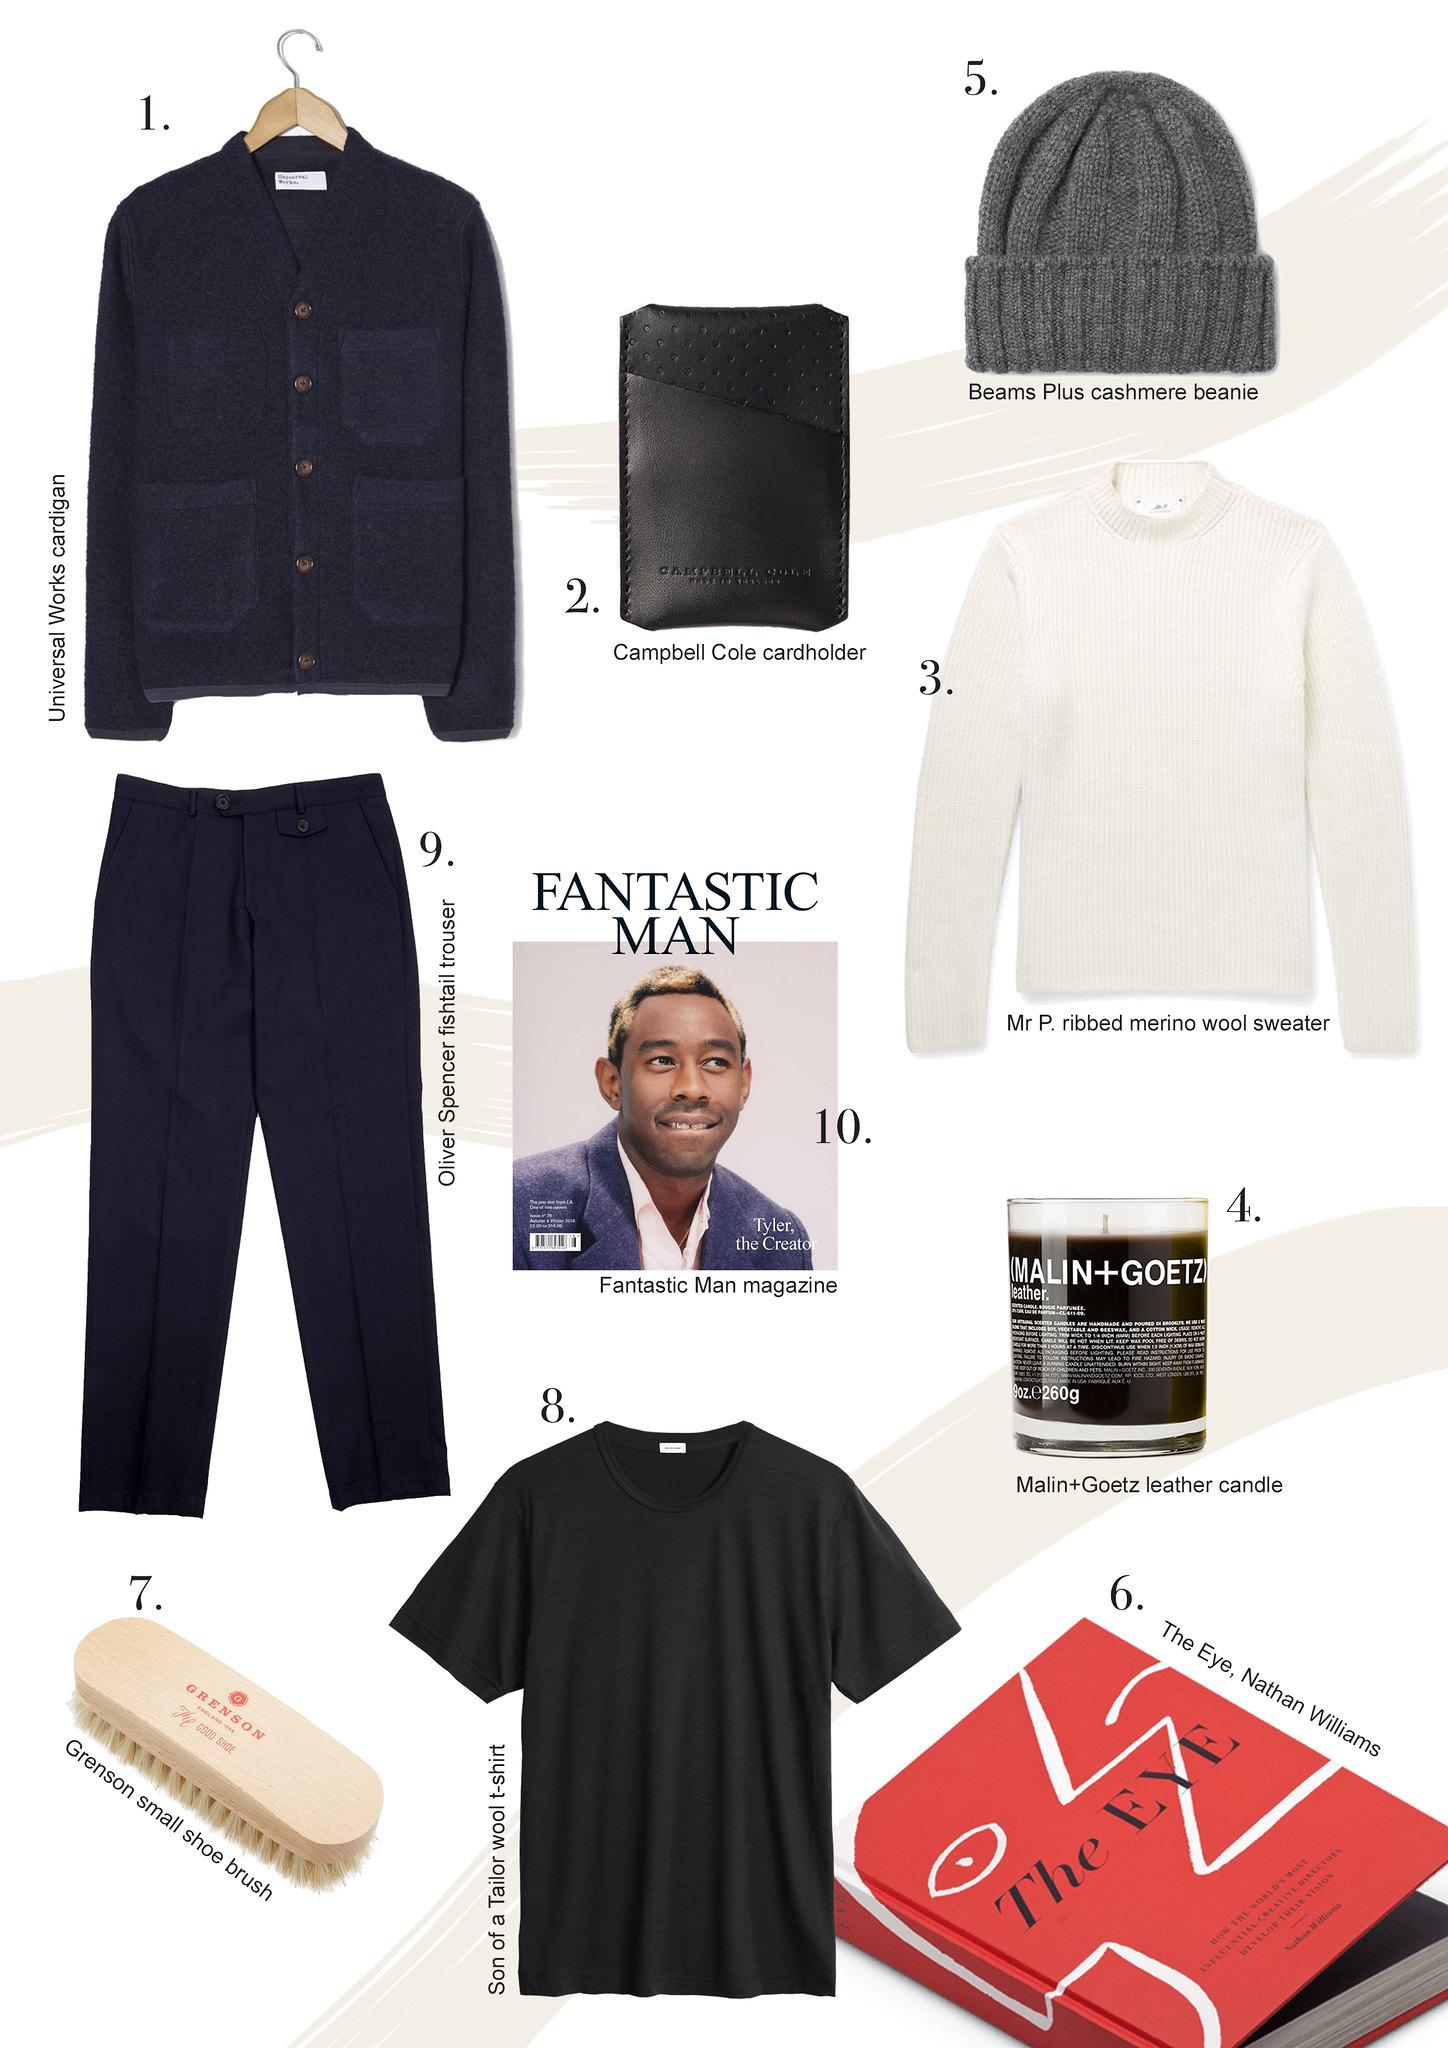 Jordan_Bunker_menswear_gift_guide_1